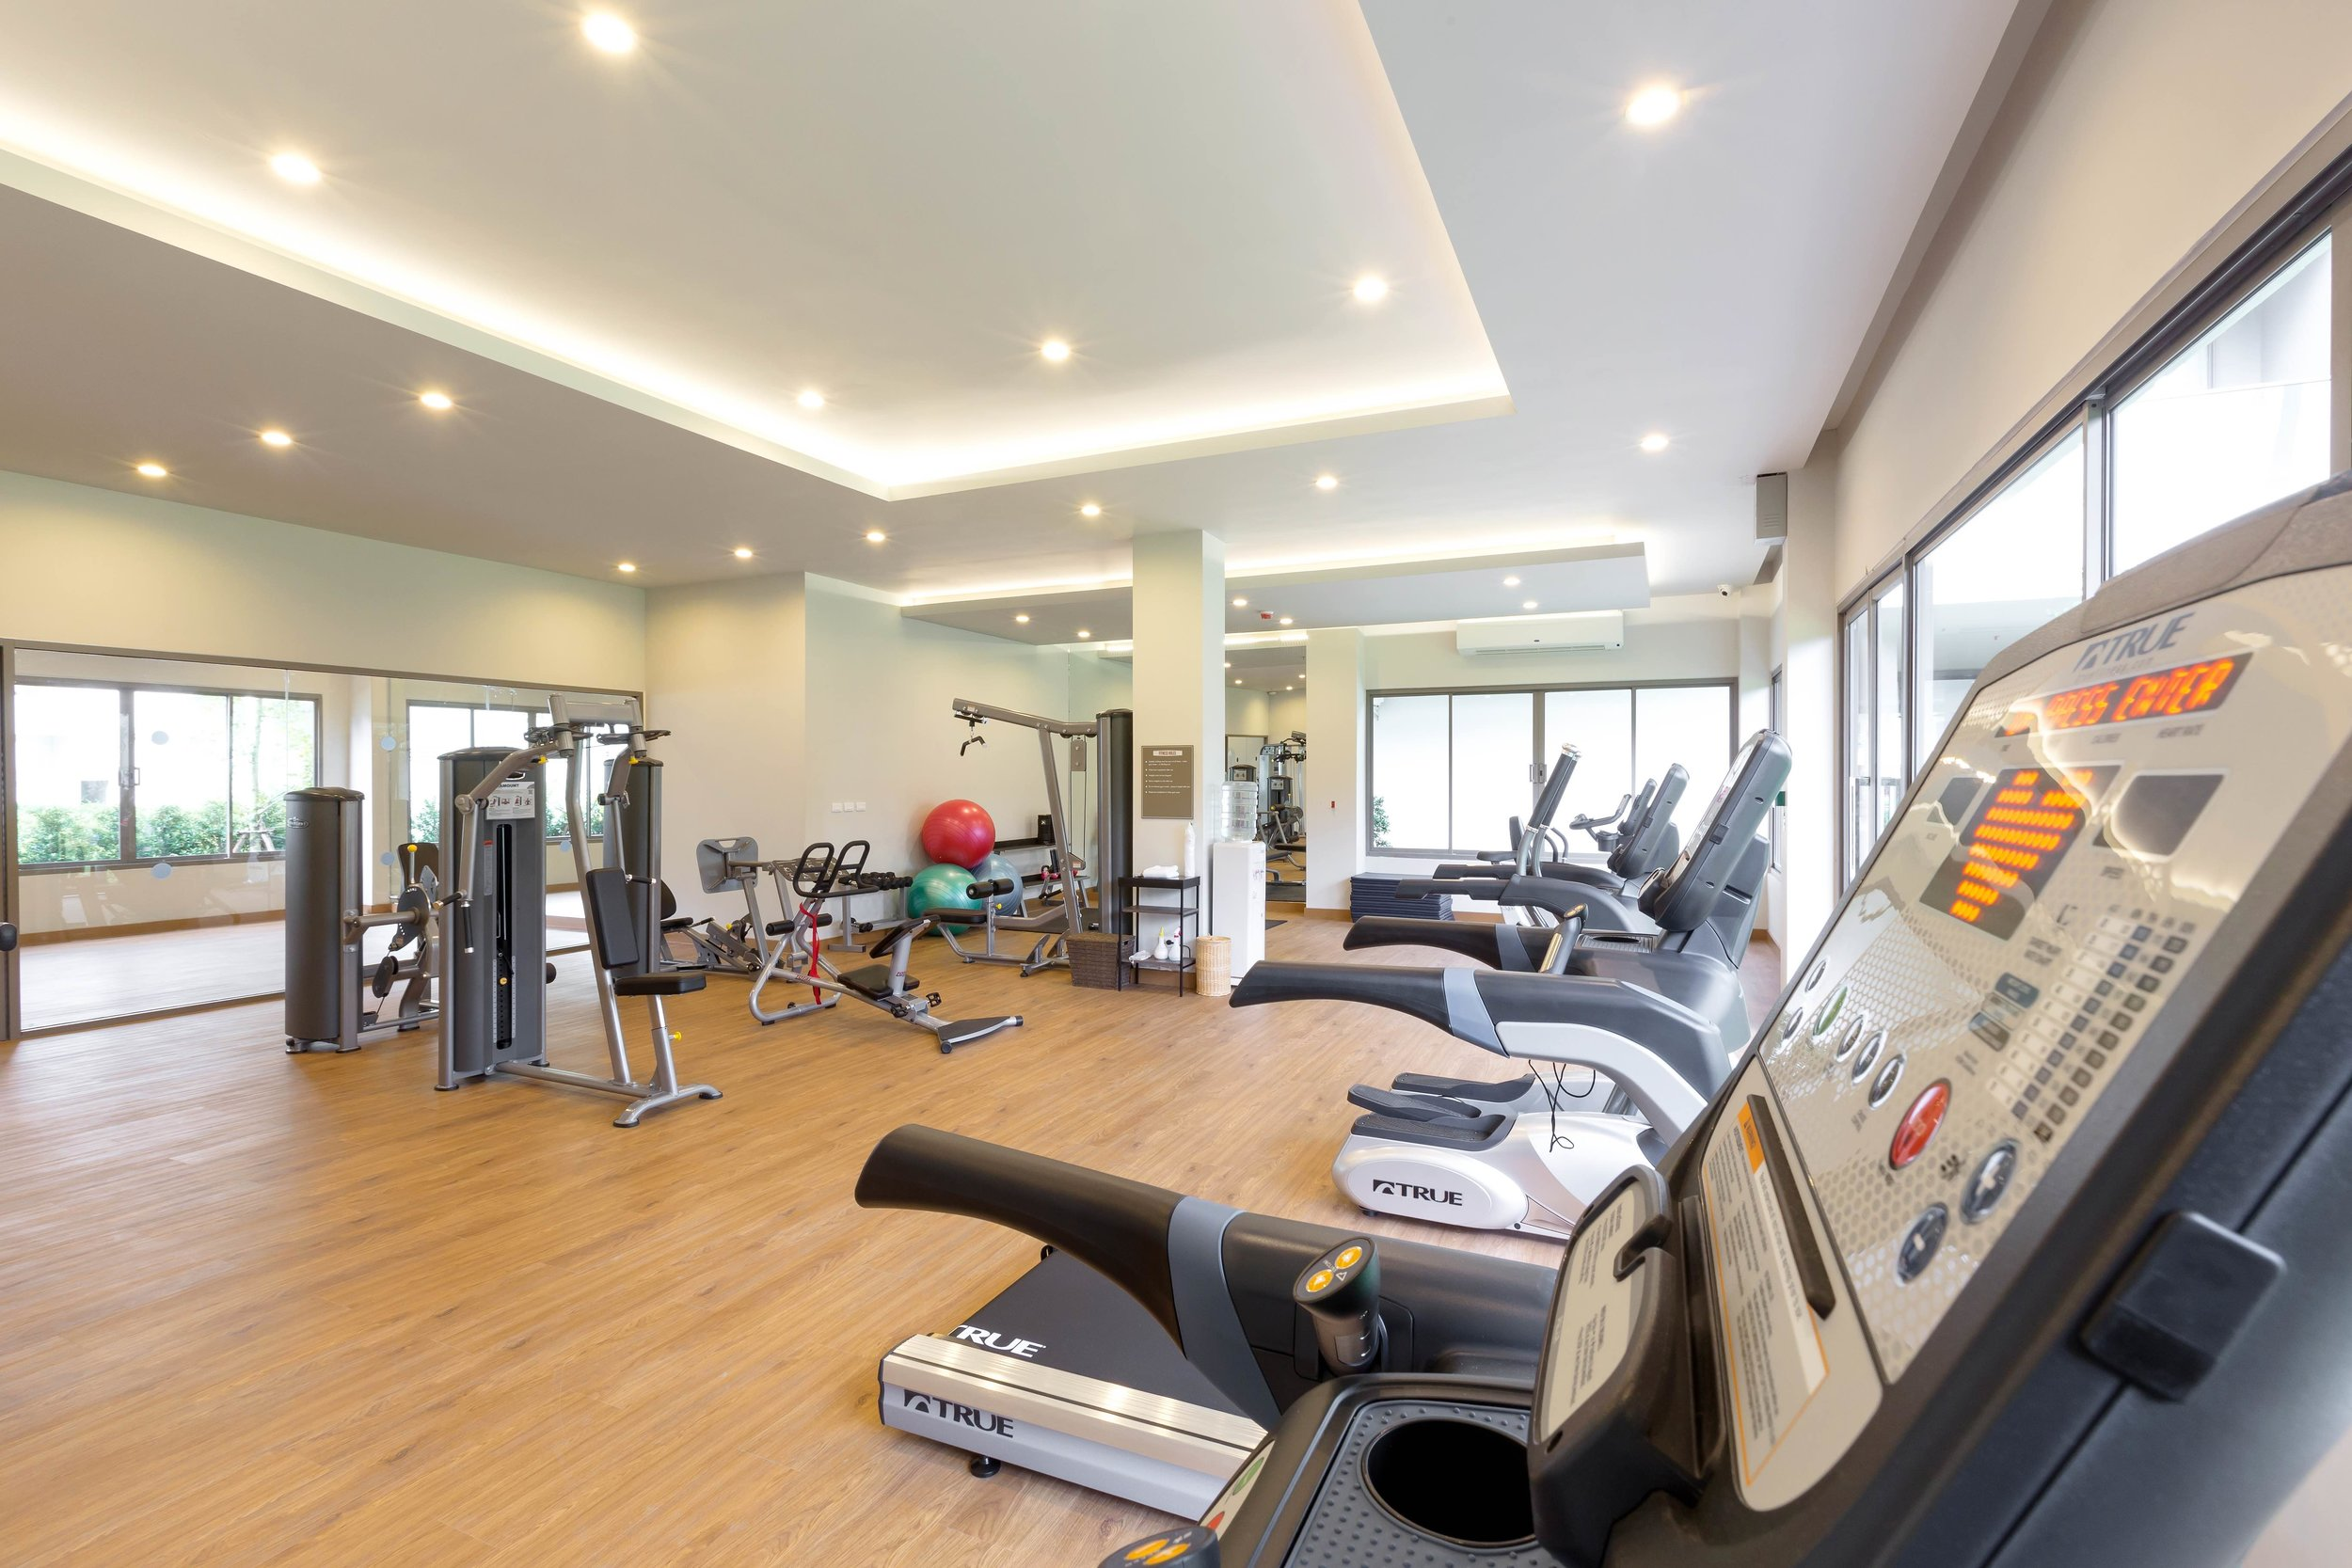 fitness_001_31153286651_o.jpg